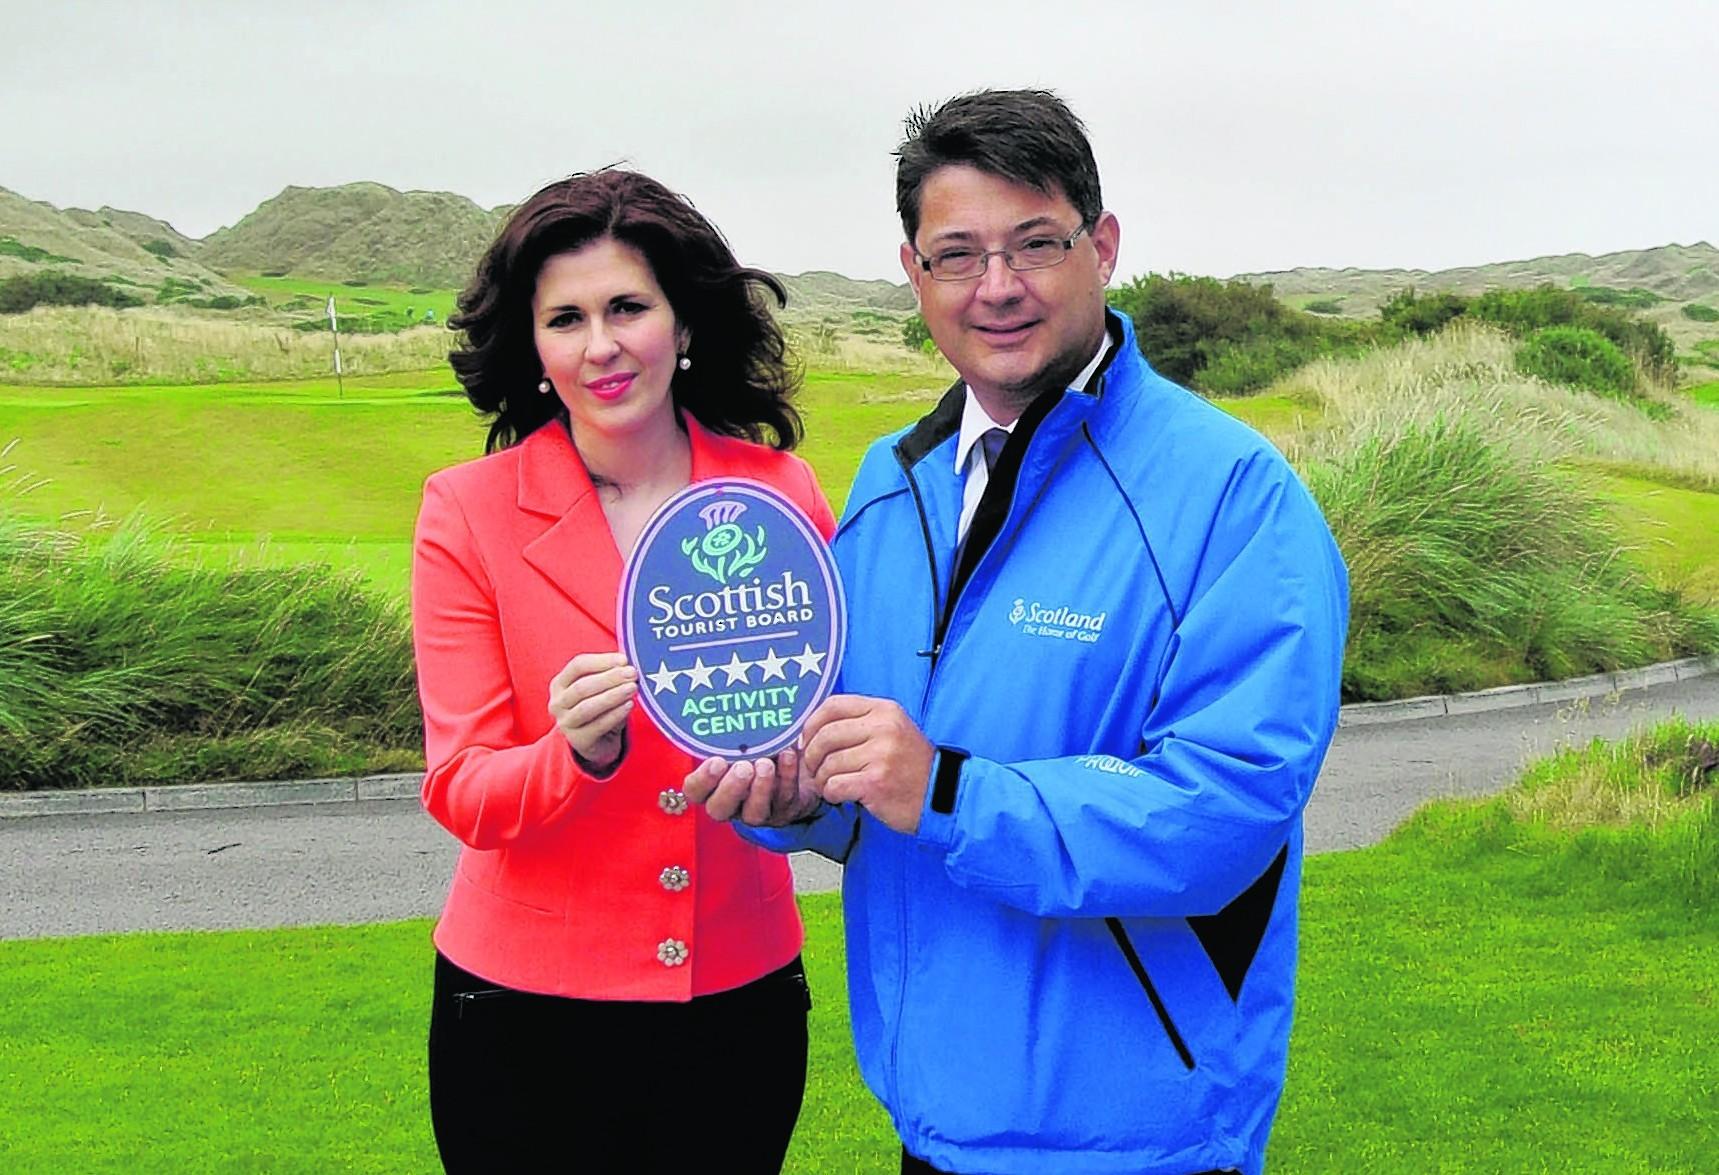 Sarah Malone, executive vice-president at Trump International Golf Links, and Philip Smith, VisitScotland regional director